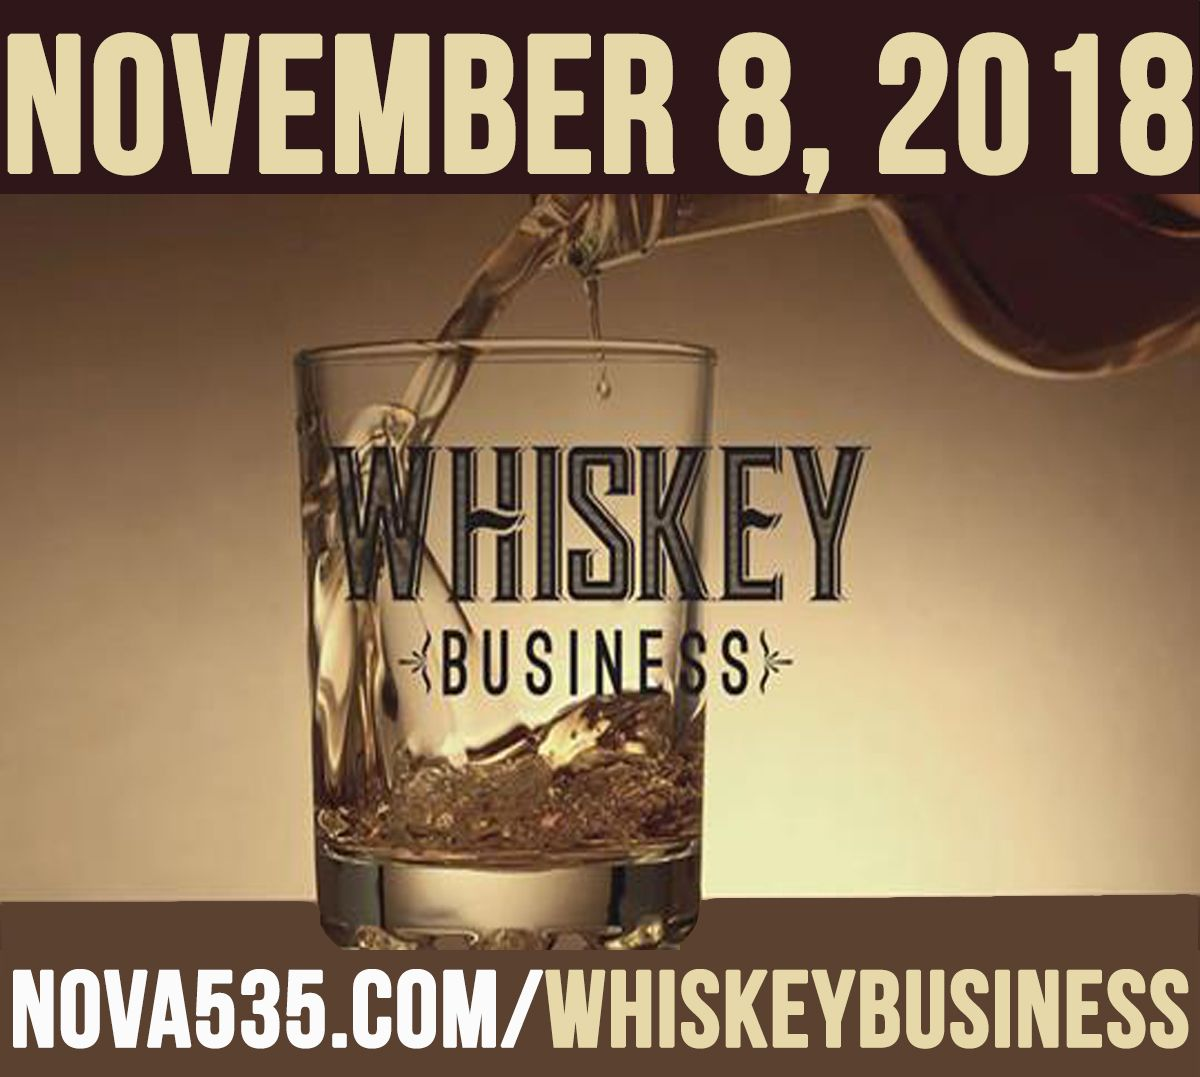 Thursday November 8, 2018 Whiskey Business at Downtown St. Pete historic venue NOVA 535 in DTSP